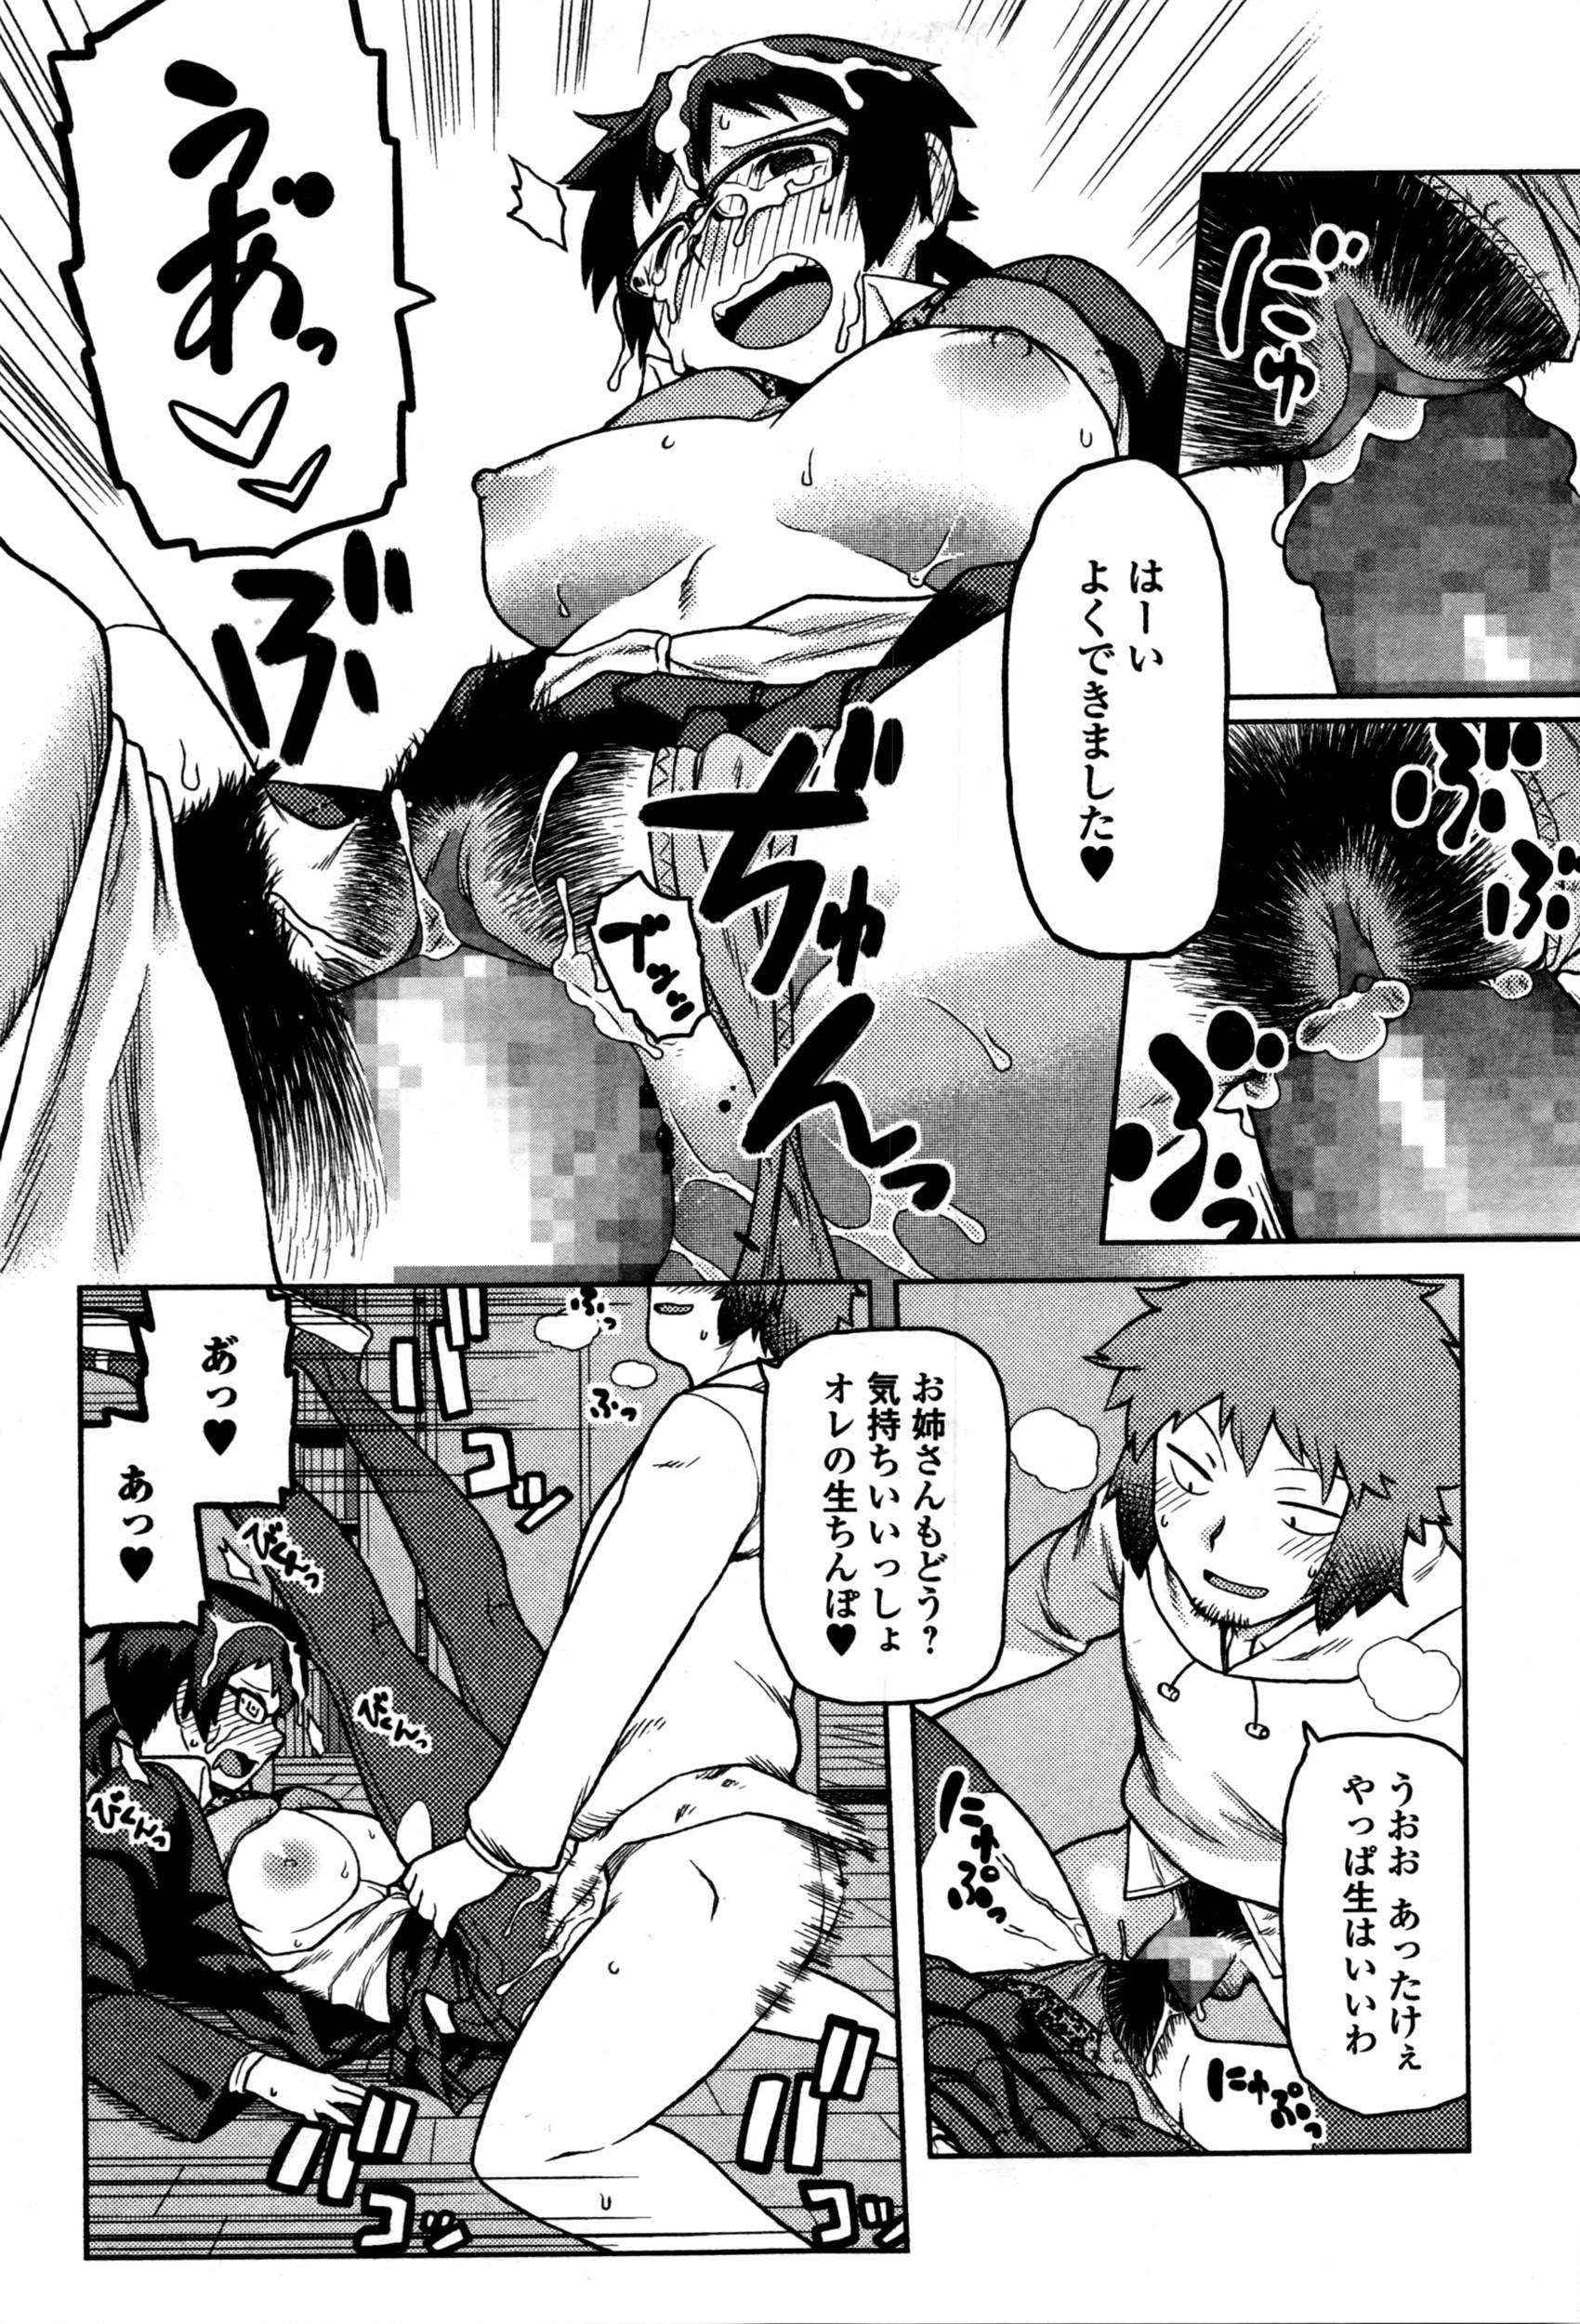 Comic JSCK Vol.3 2016-03 245